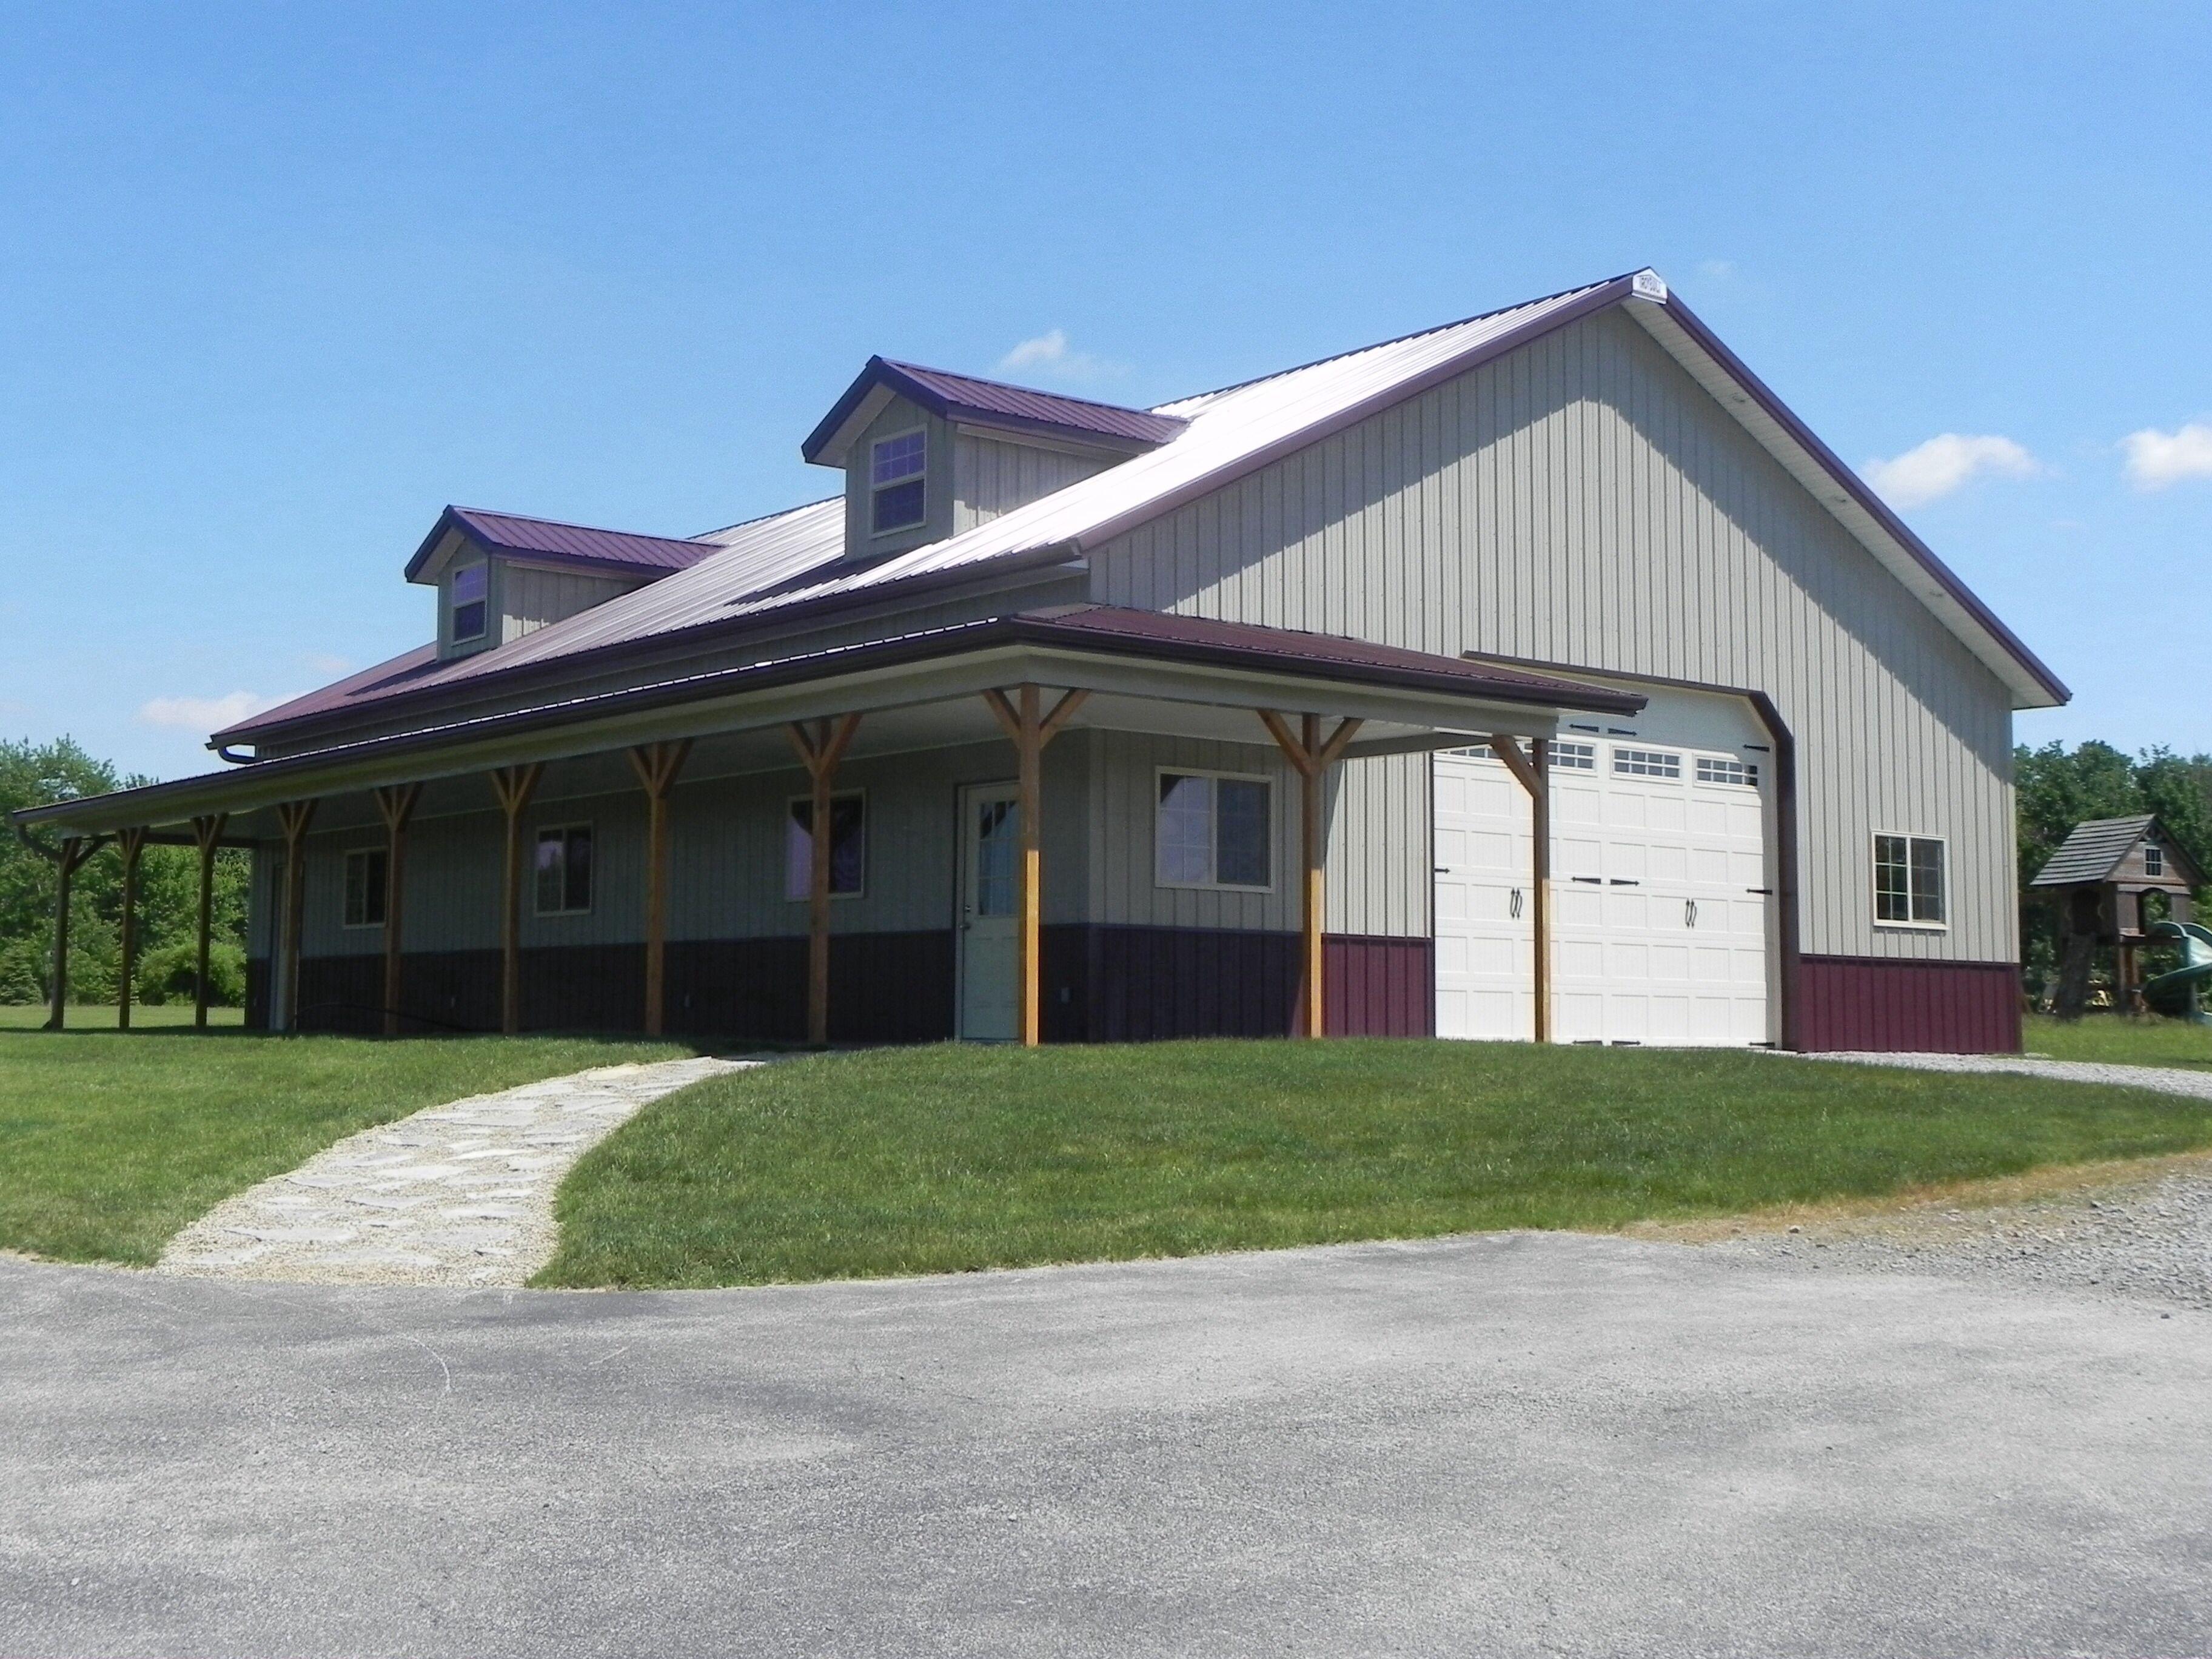 40x56 pole barn Pole barn homes, Metal buildings, Custom